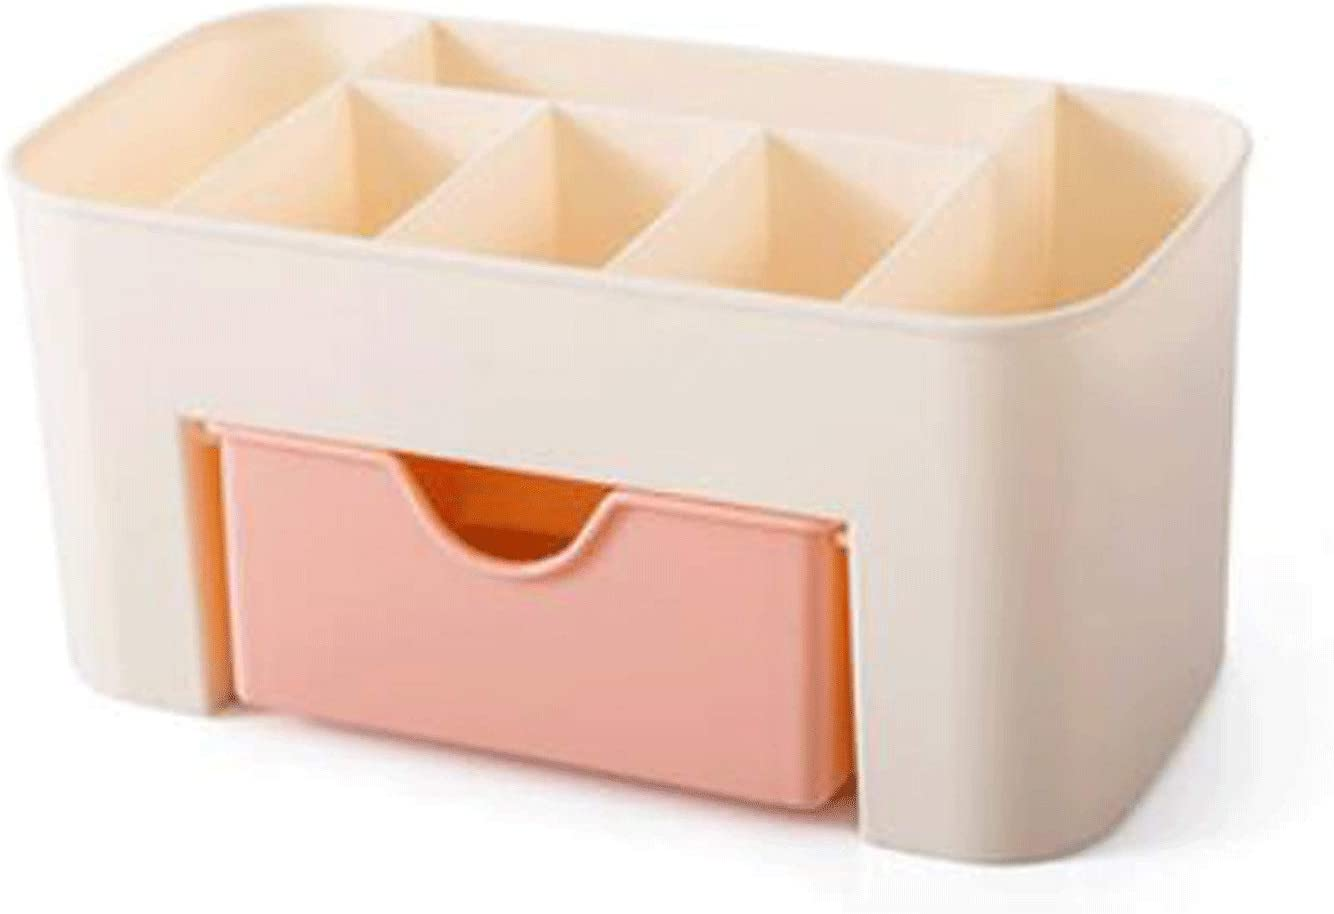 Nicwagrlzwl Translated Storage Basket 2210.310cm Decorative Household Stora Inventory cleanup selling sale